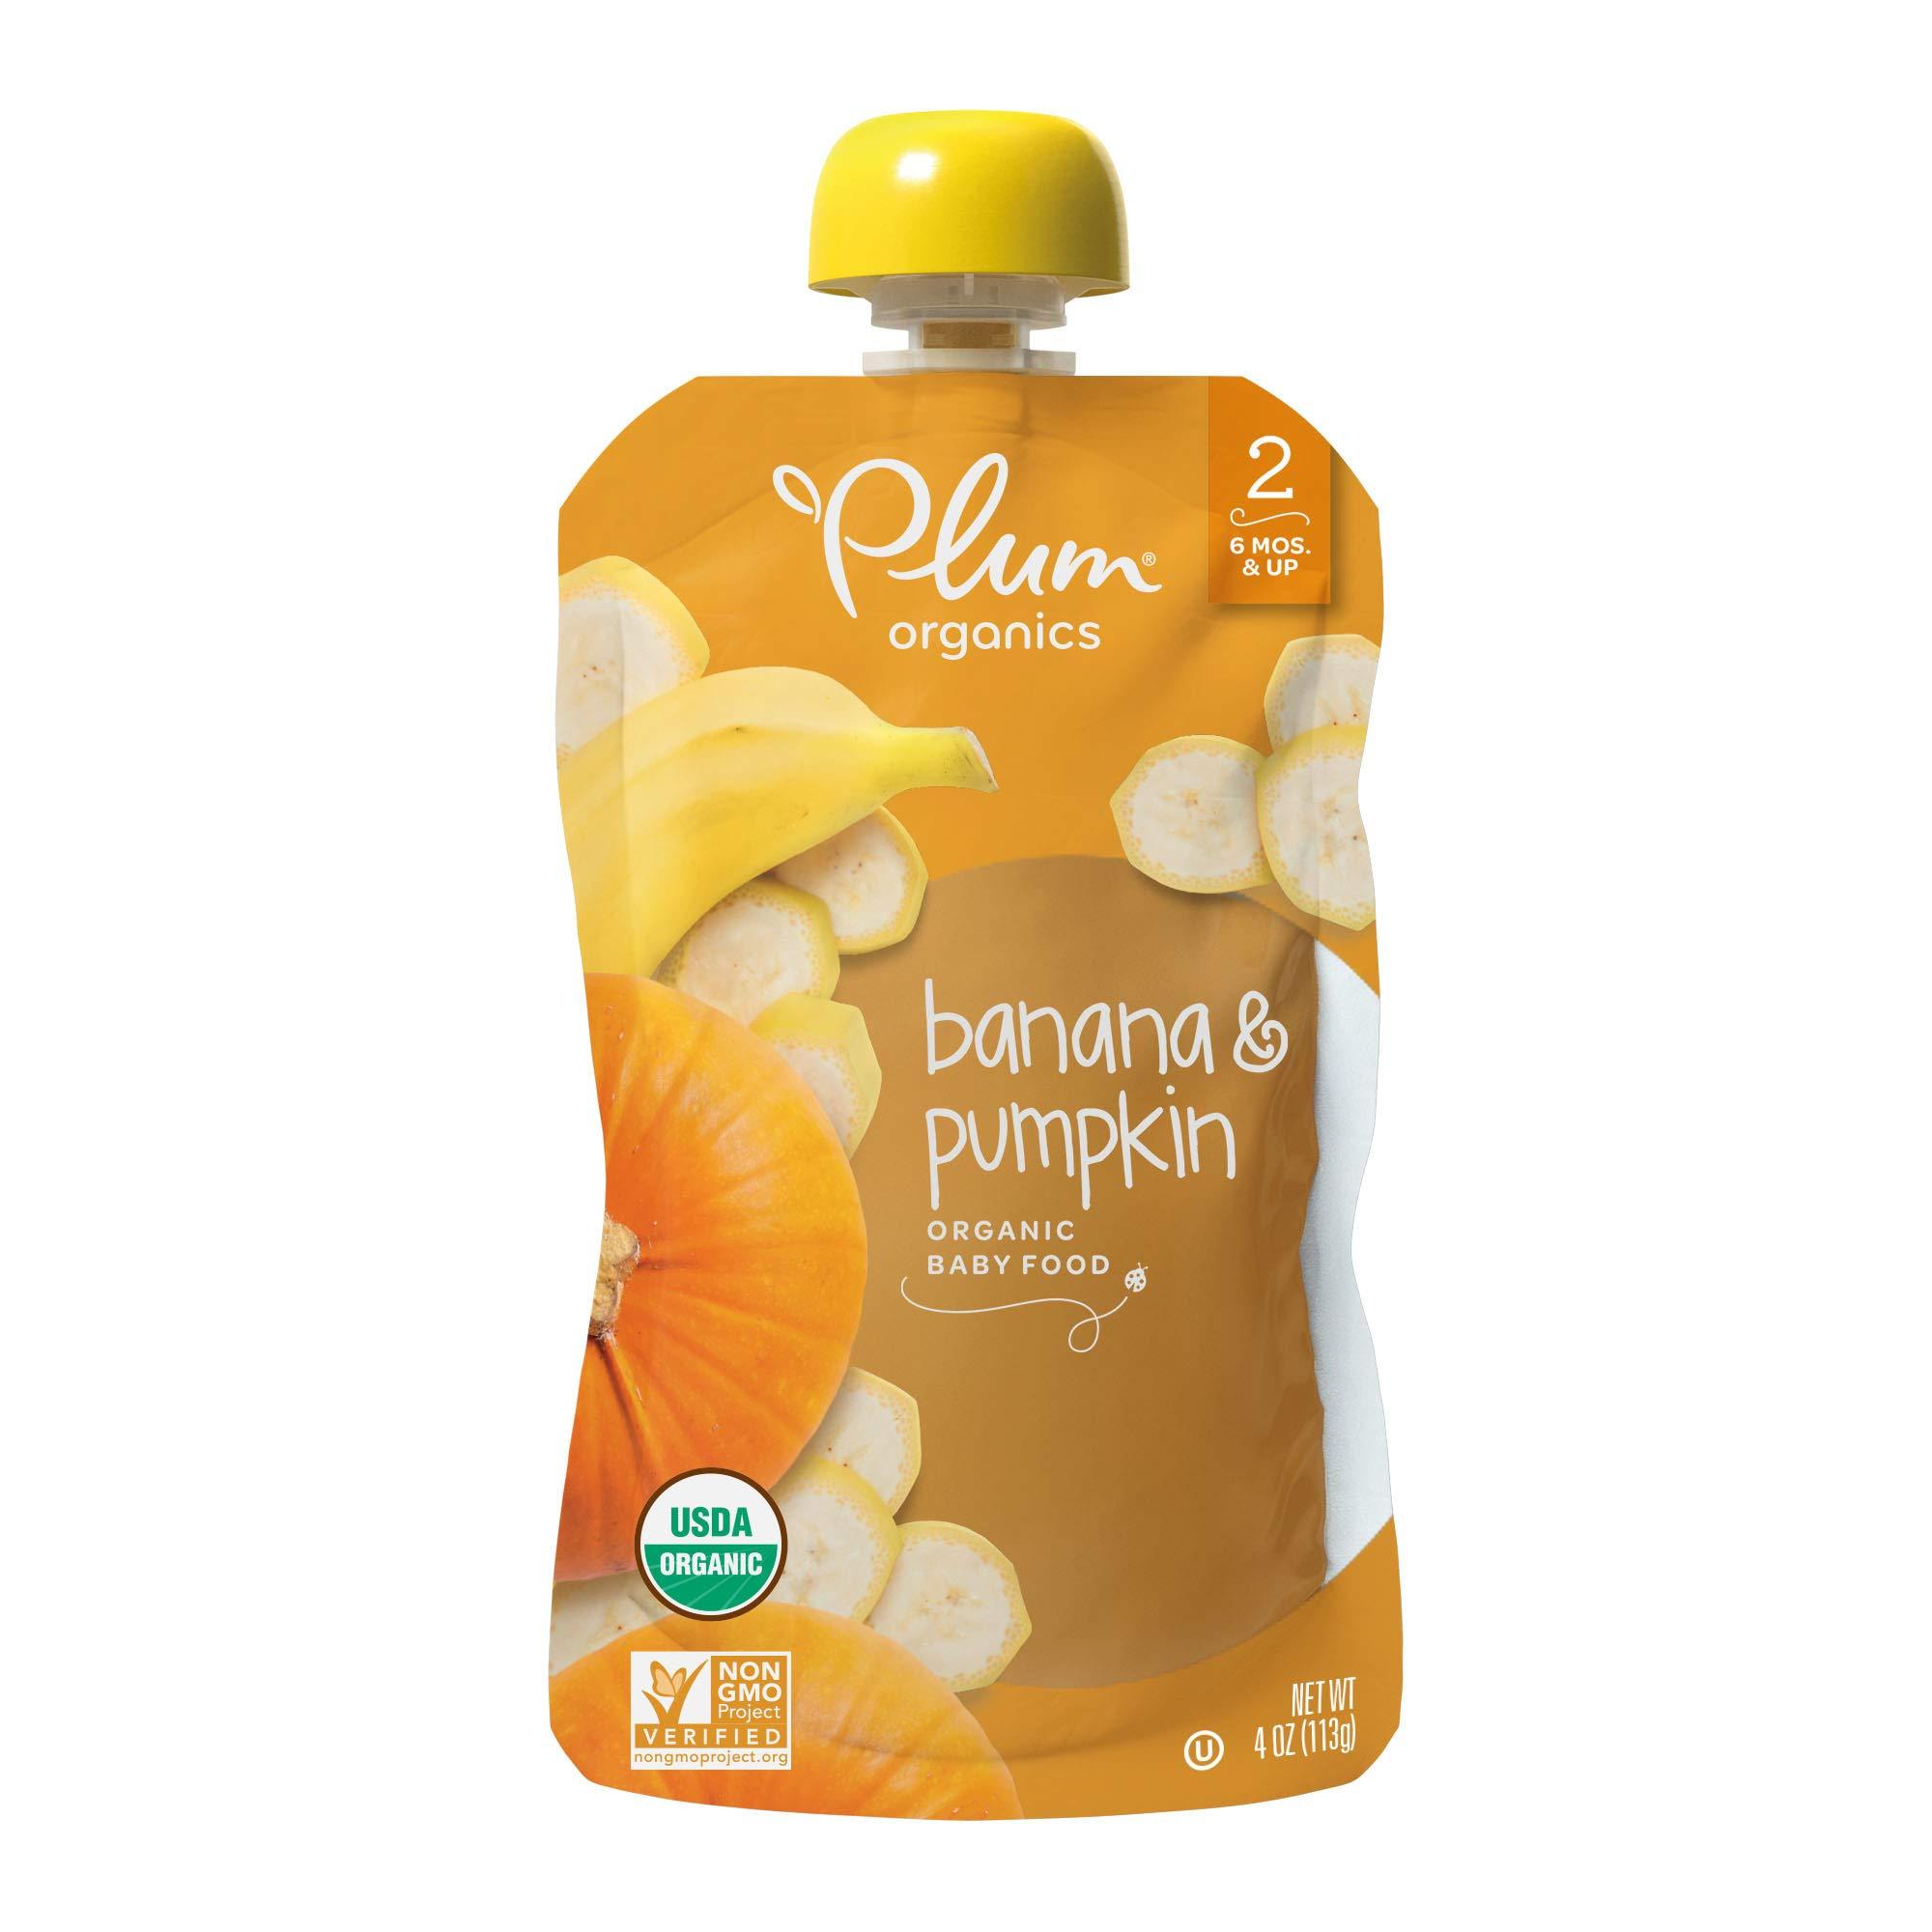 Plum Organics Stage 2, Organic Baby Food, Banana, and Pumpkin, 4 Ounce